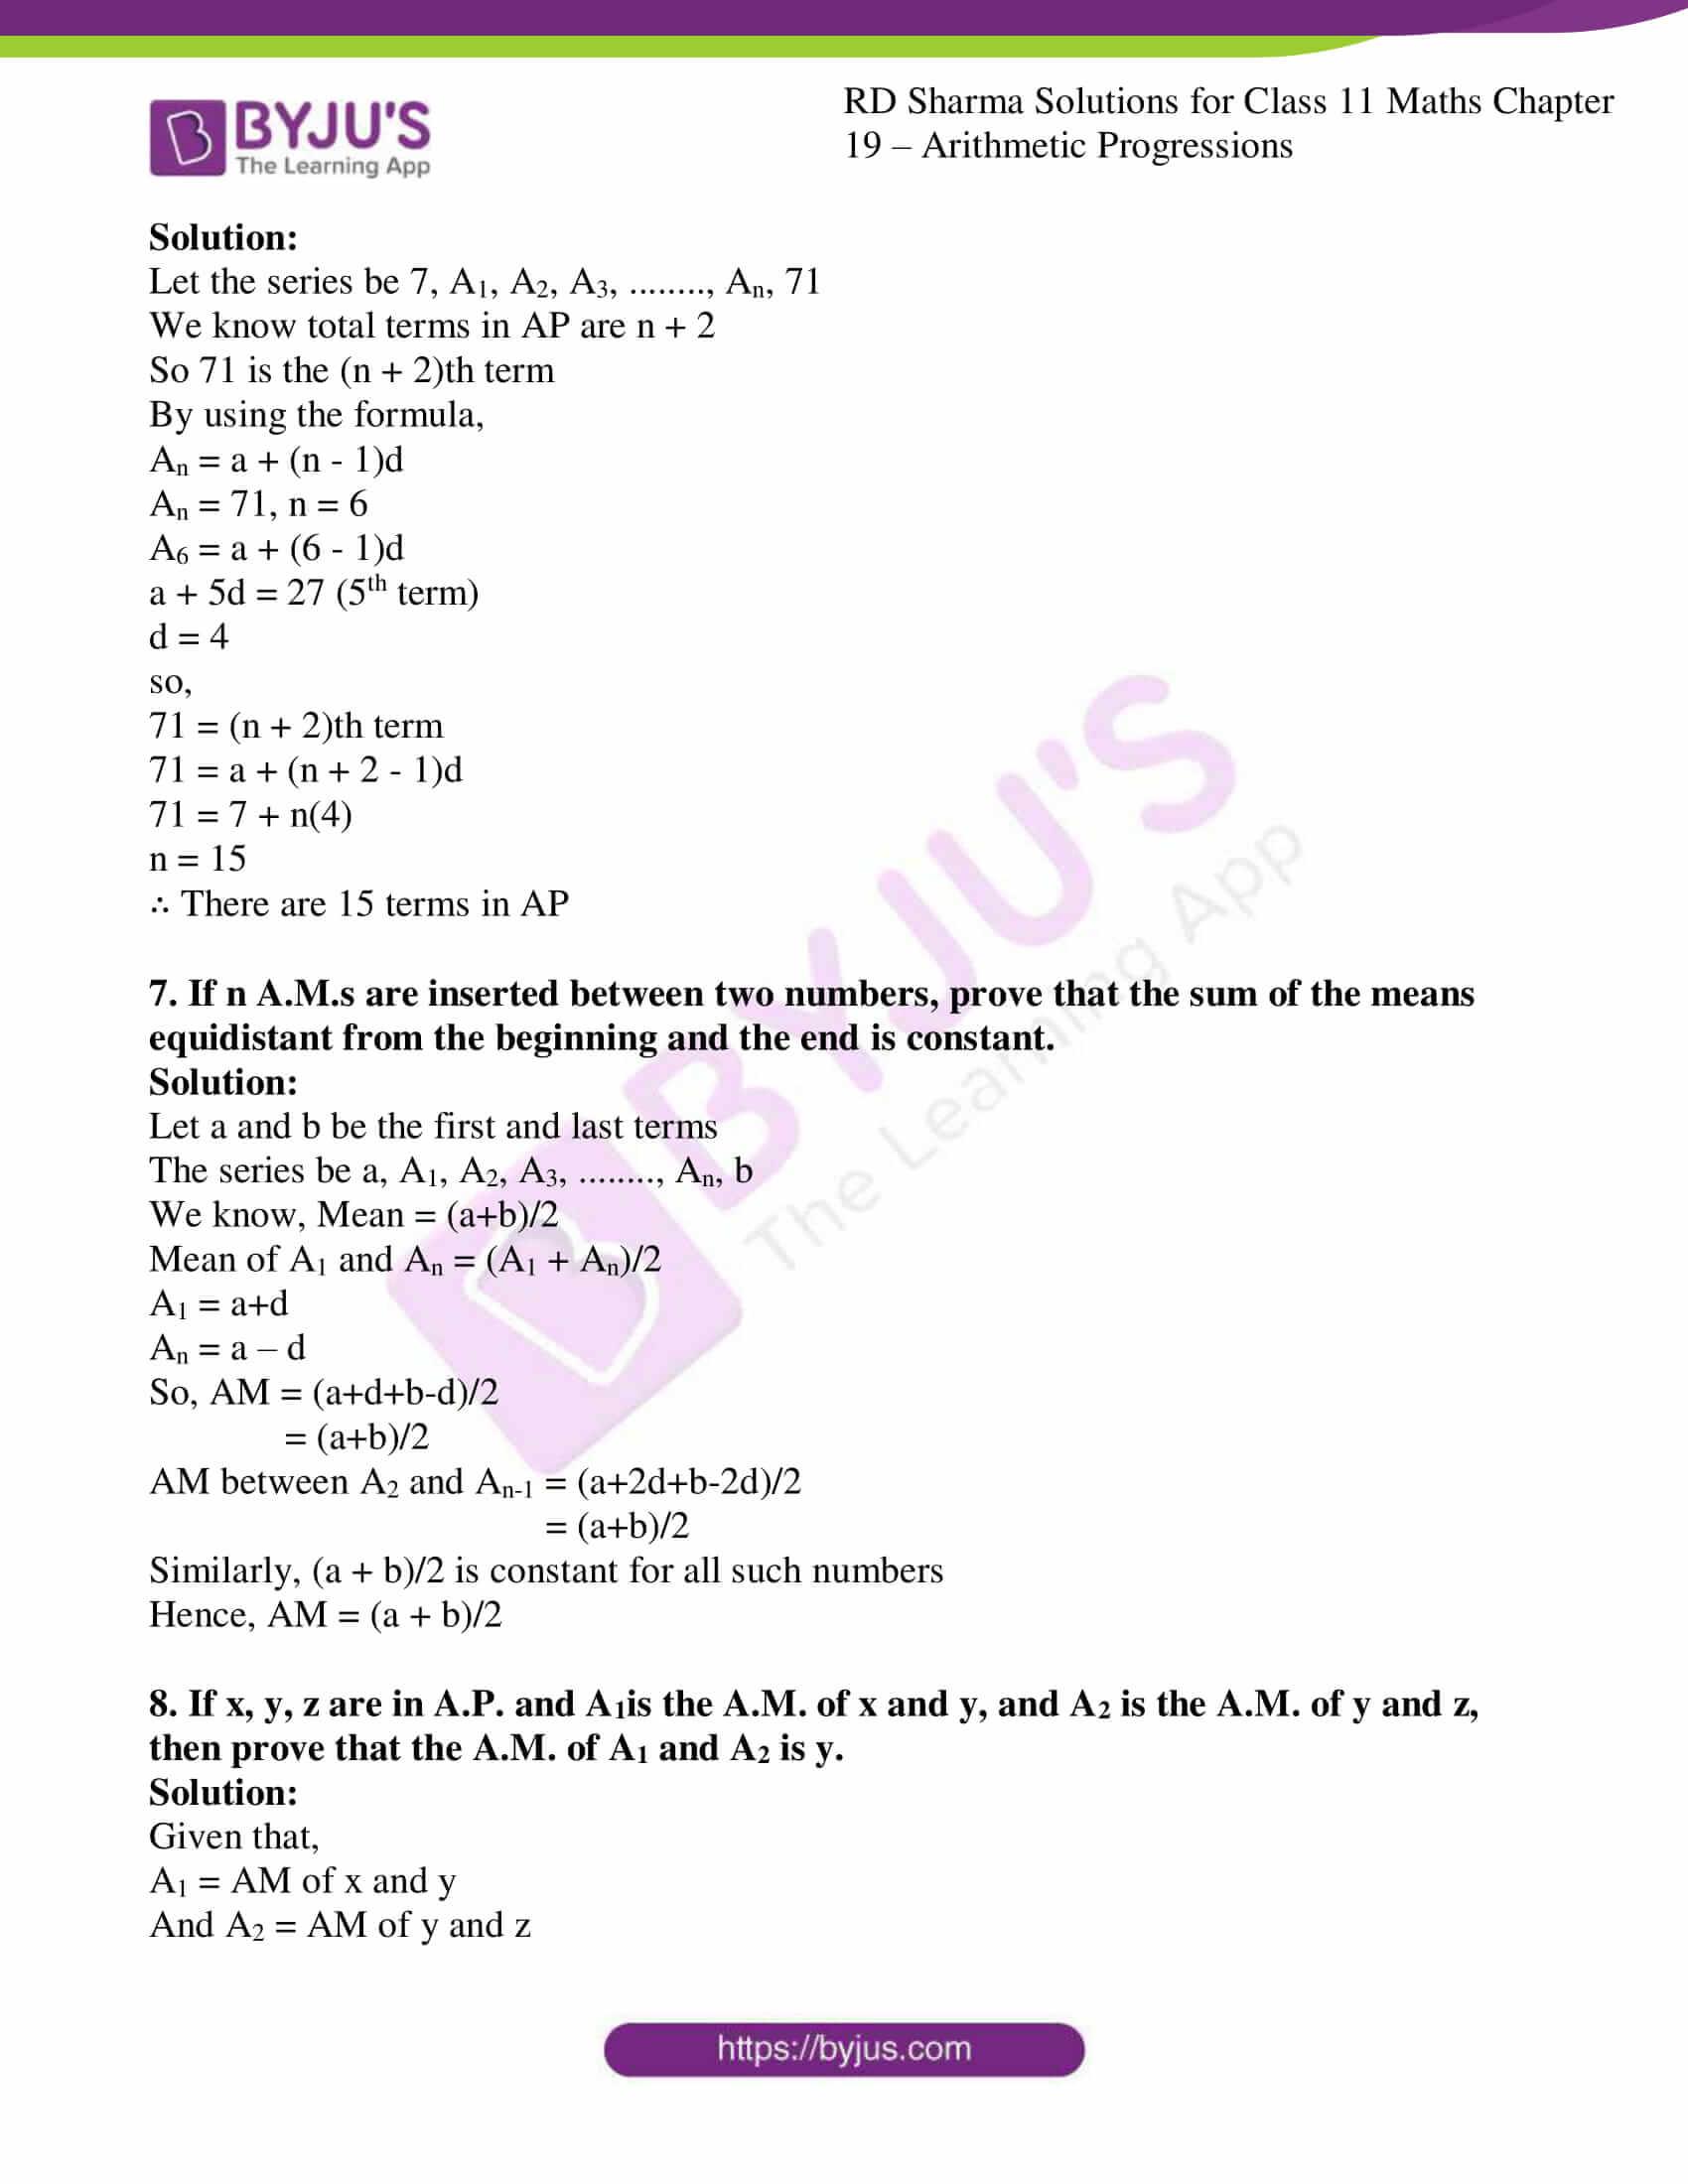 rd sharma class 11 maths ch 19 ex 6 4